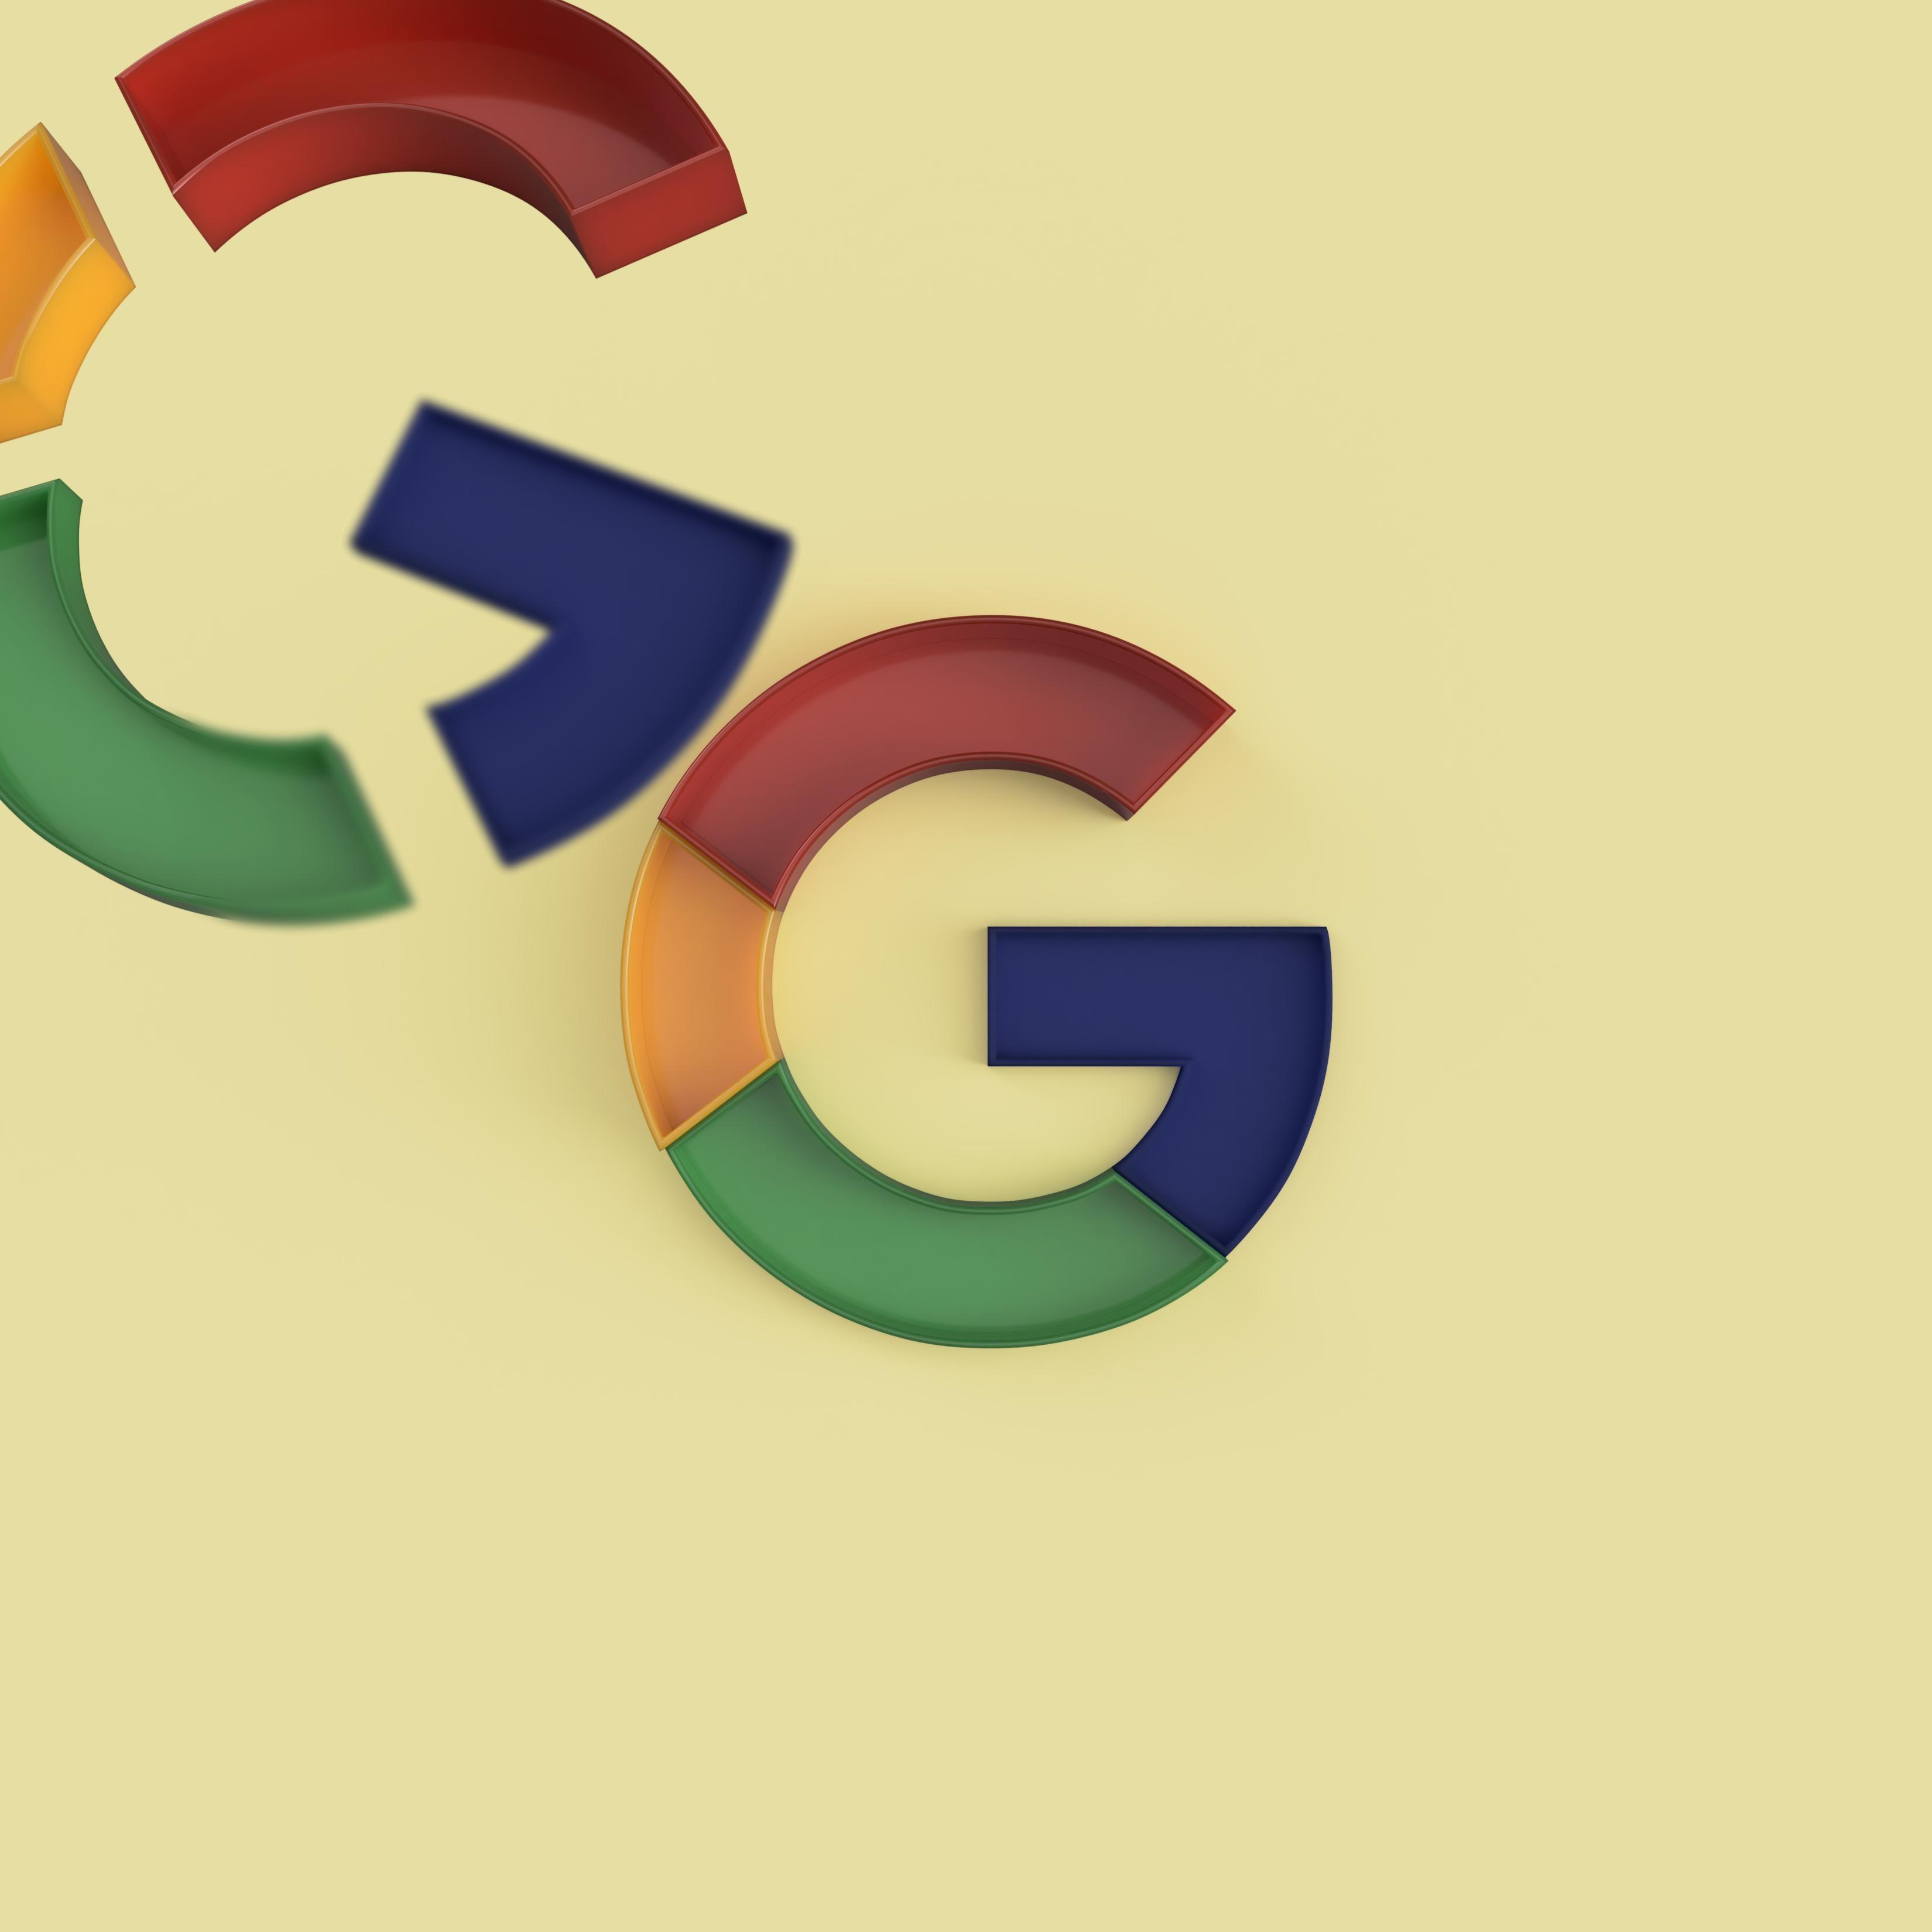 Google-3d-lcs20192fab3-3500-3500